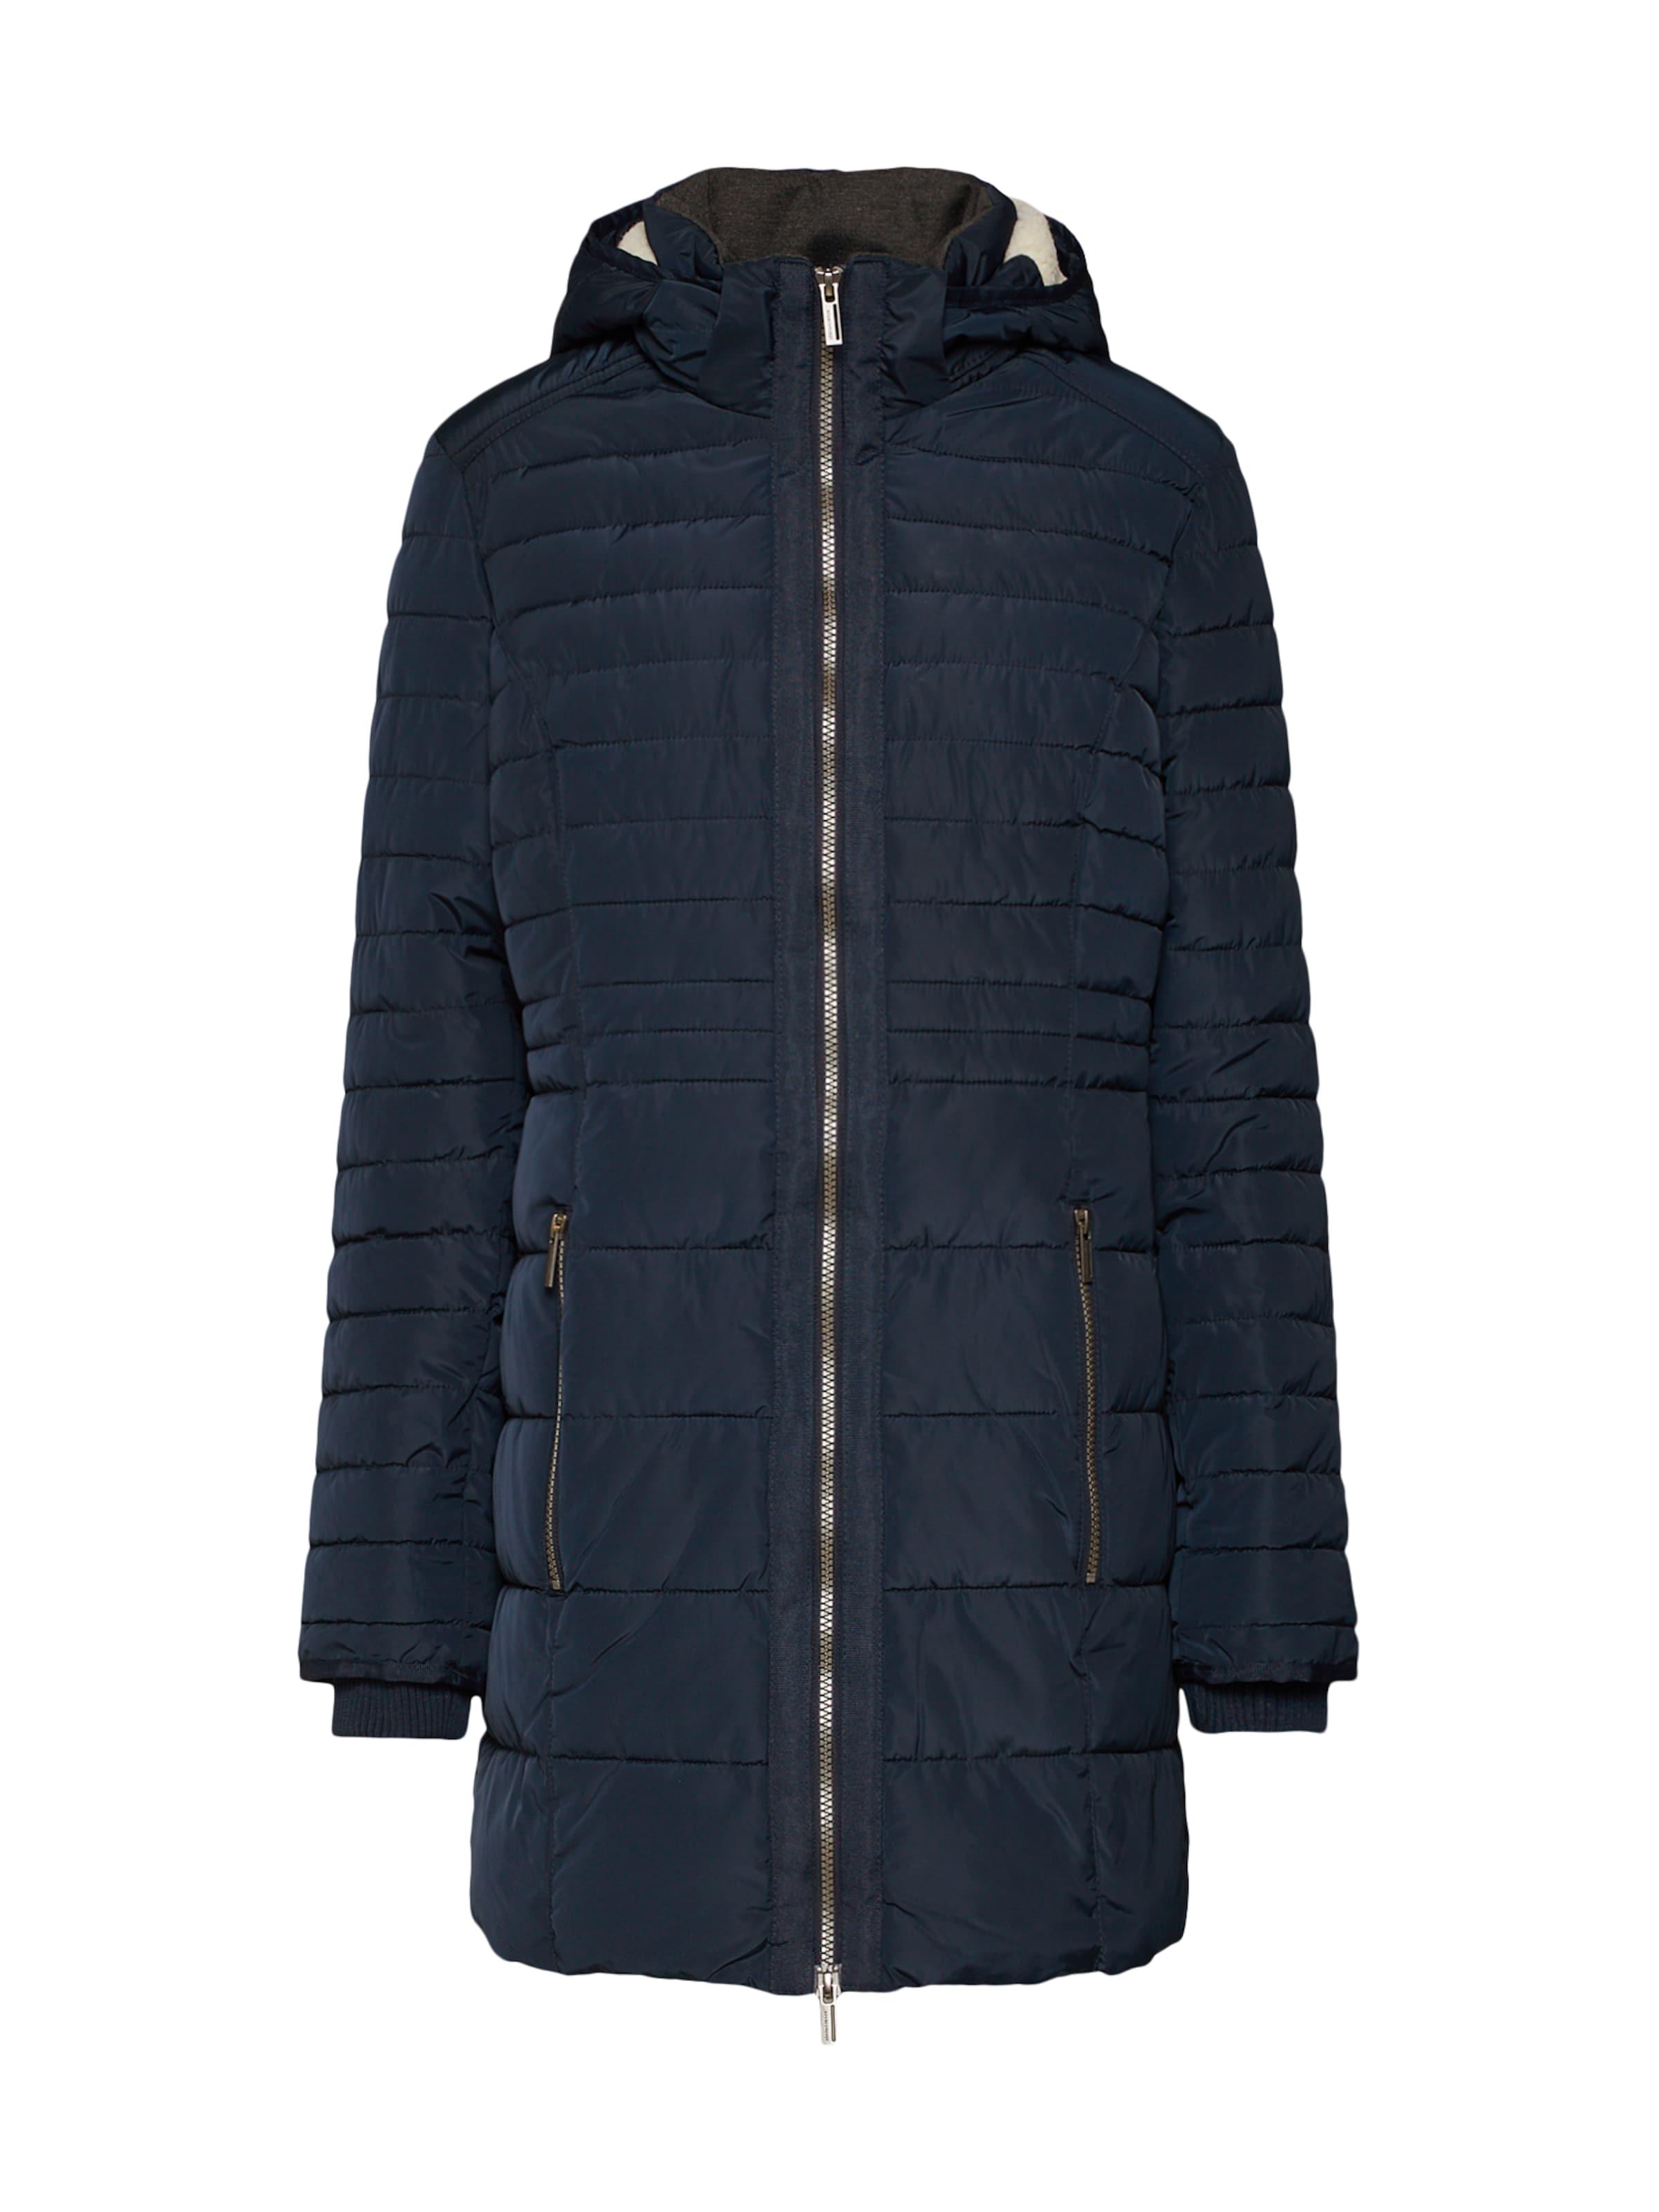 En Bleu D'hiver nina Nuit Manteau 'sc 3' Soyaconcept 8OnXk0wP